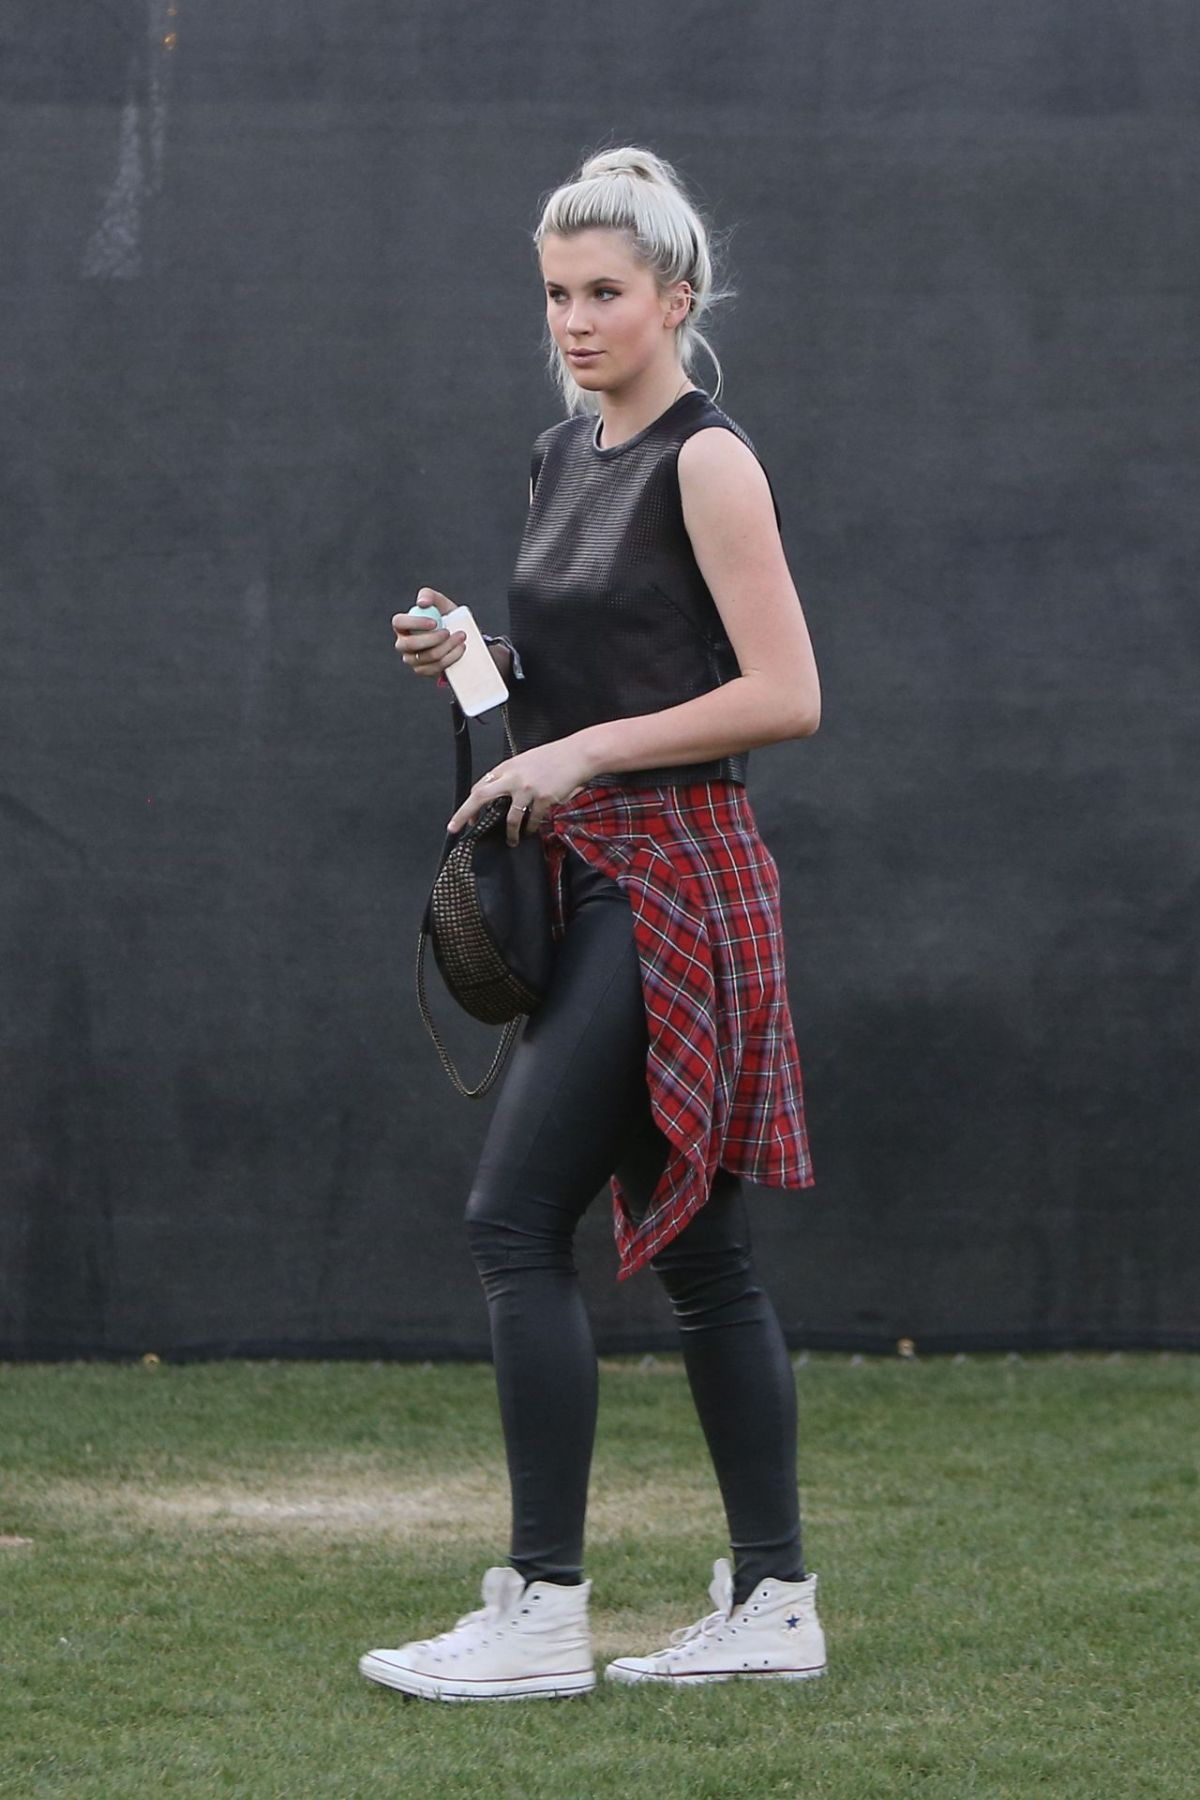 IRELAND BALDWIN at Coachella Music Festival - HawtCelebs